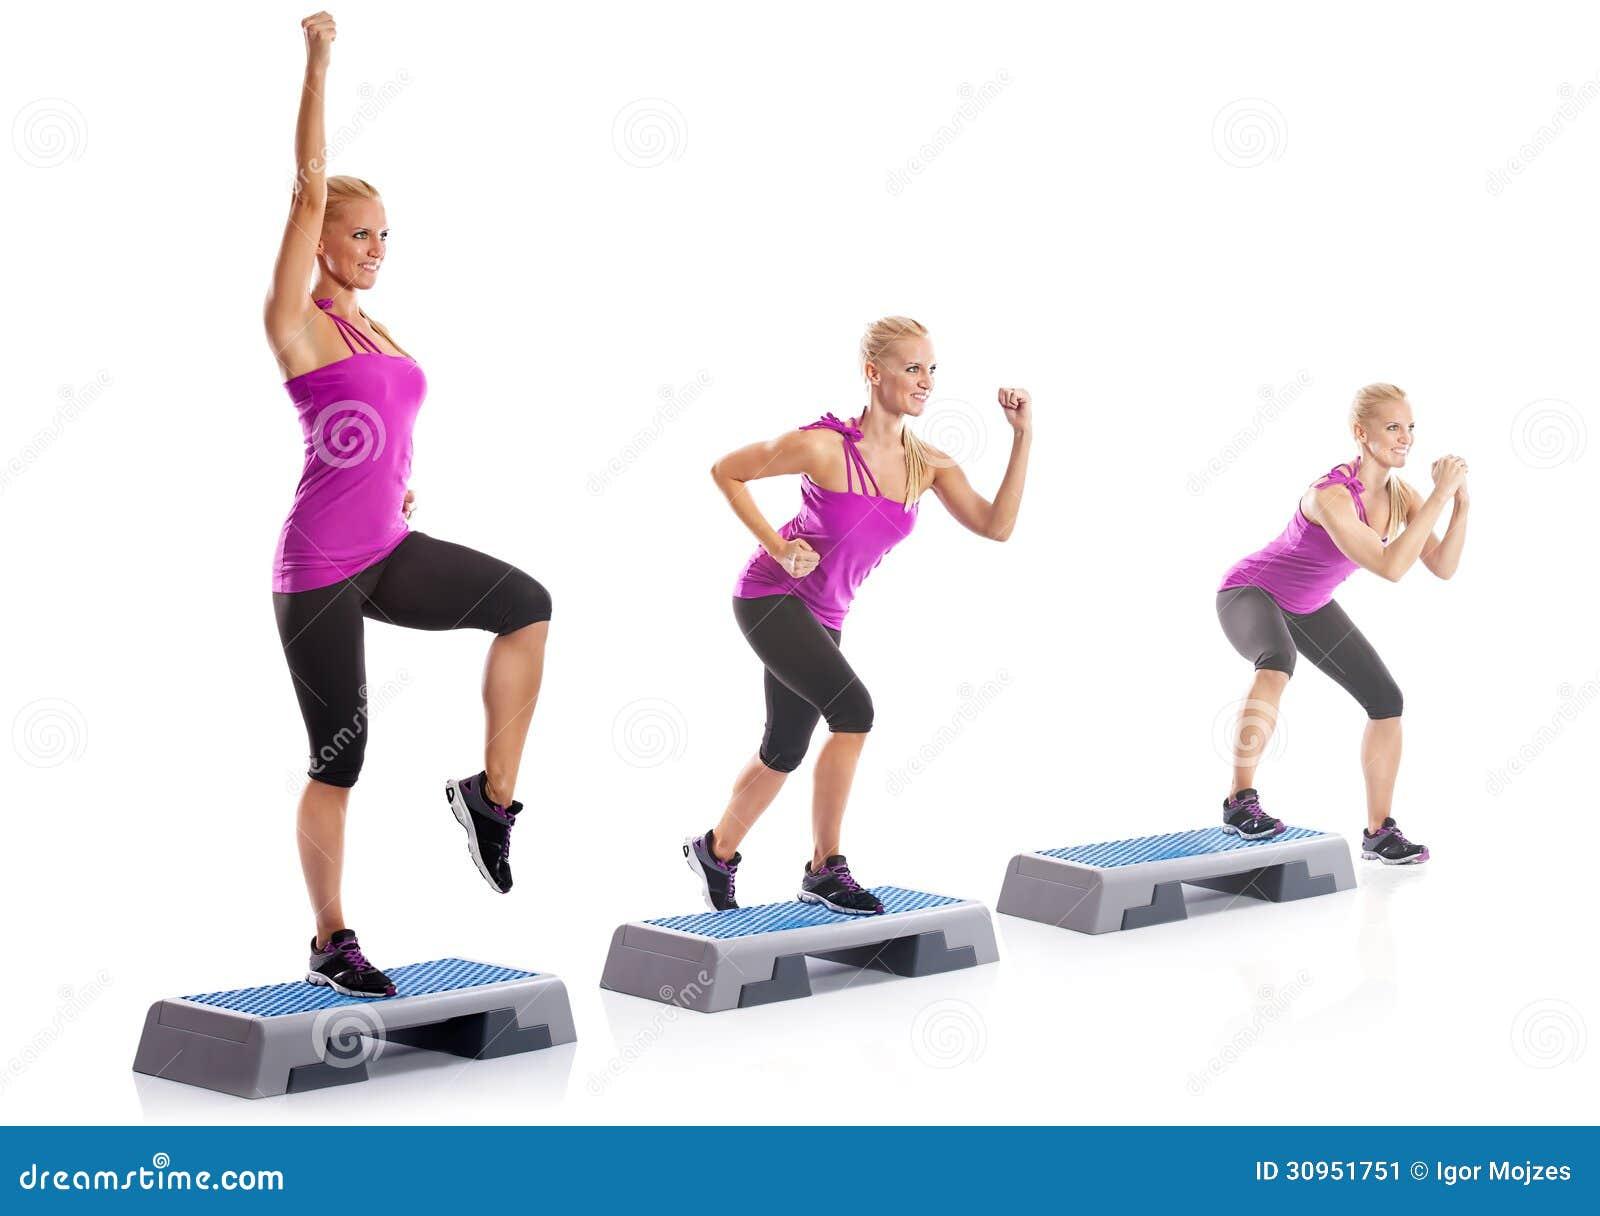 Beginner Step Aerobics Routines